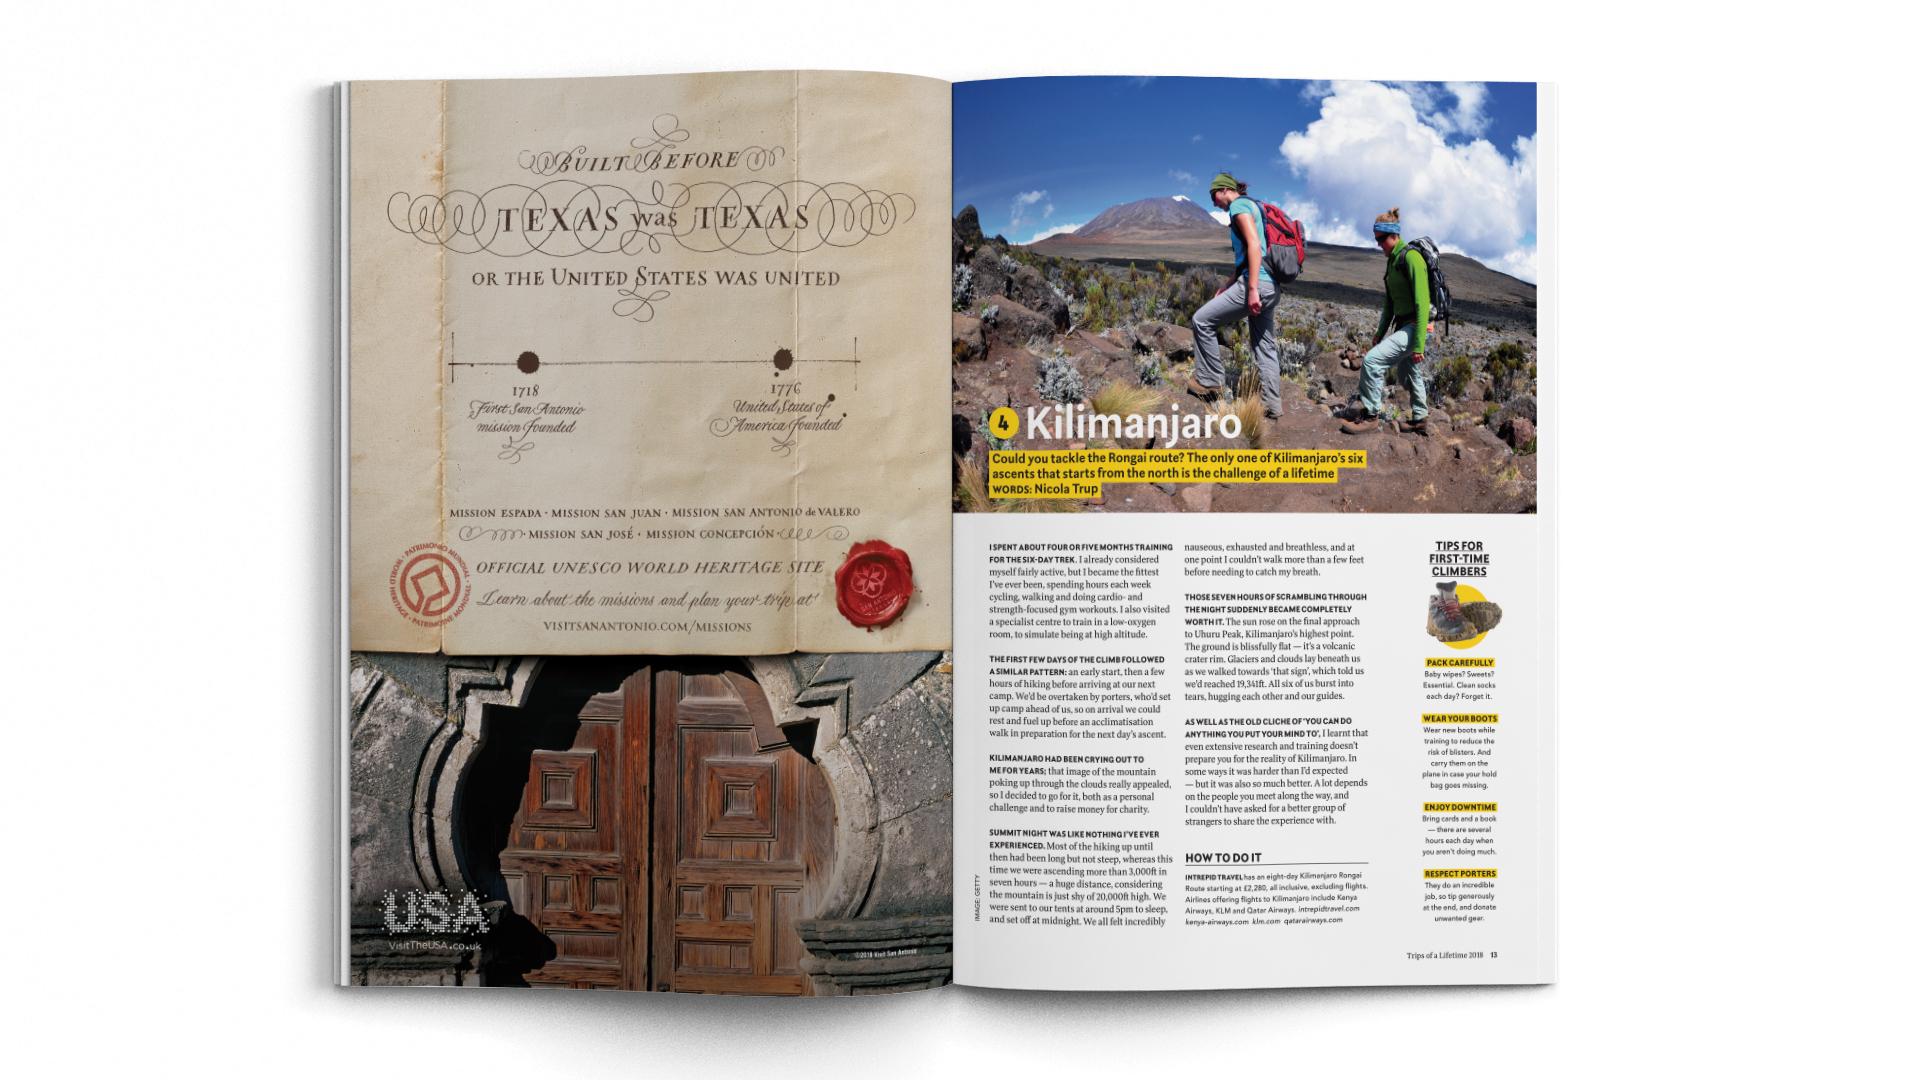 A4-Magazine-DPS-NGT-TRIPS-Kilimanjaro